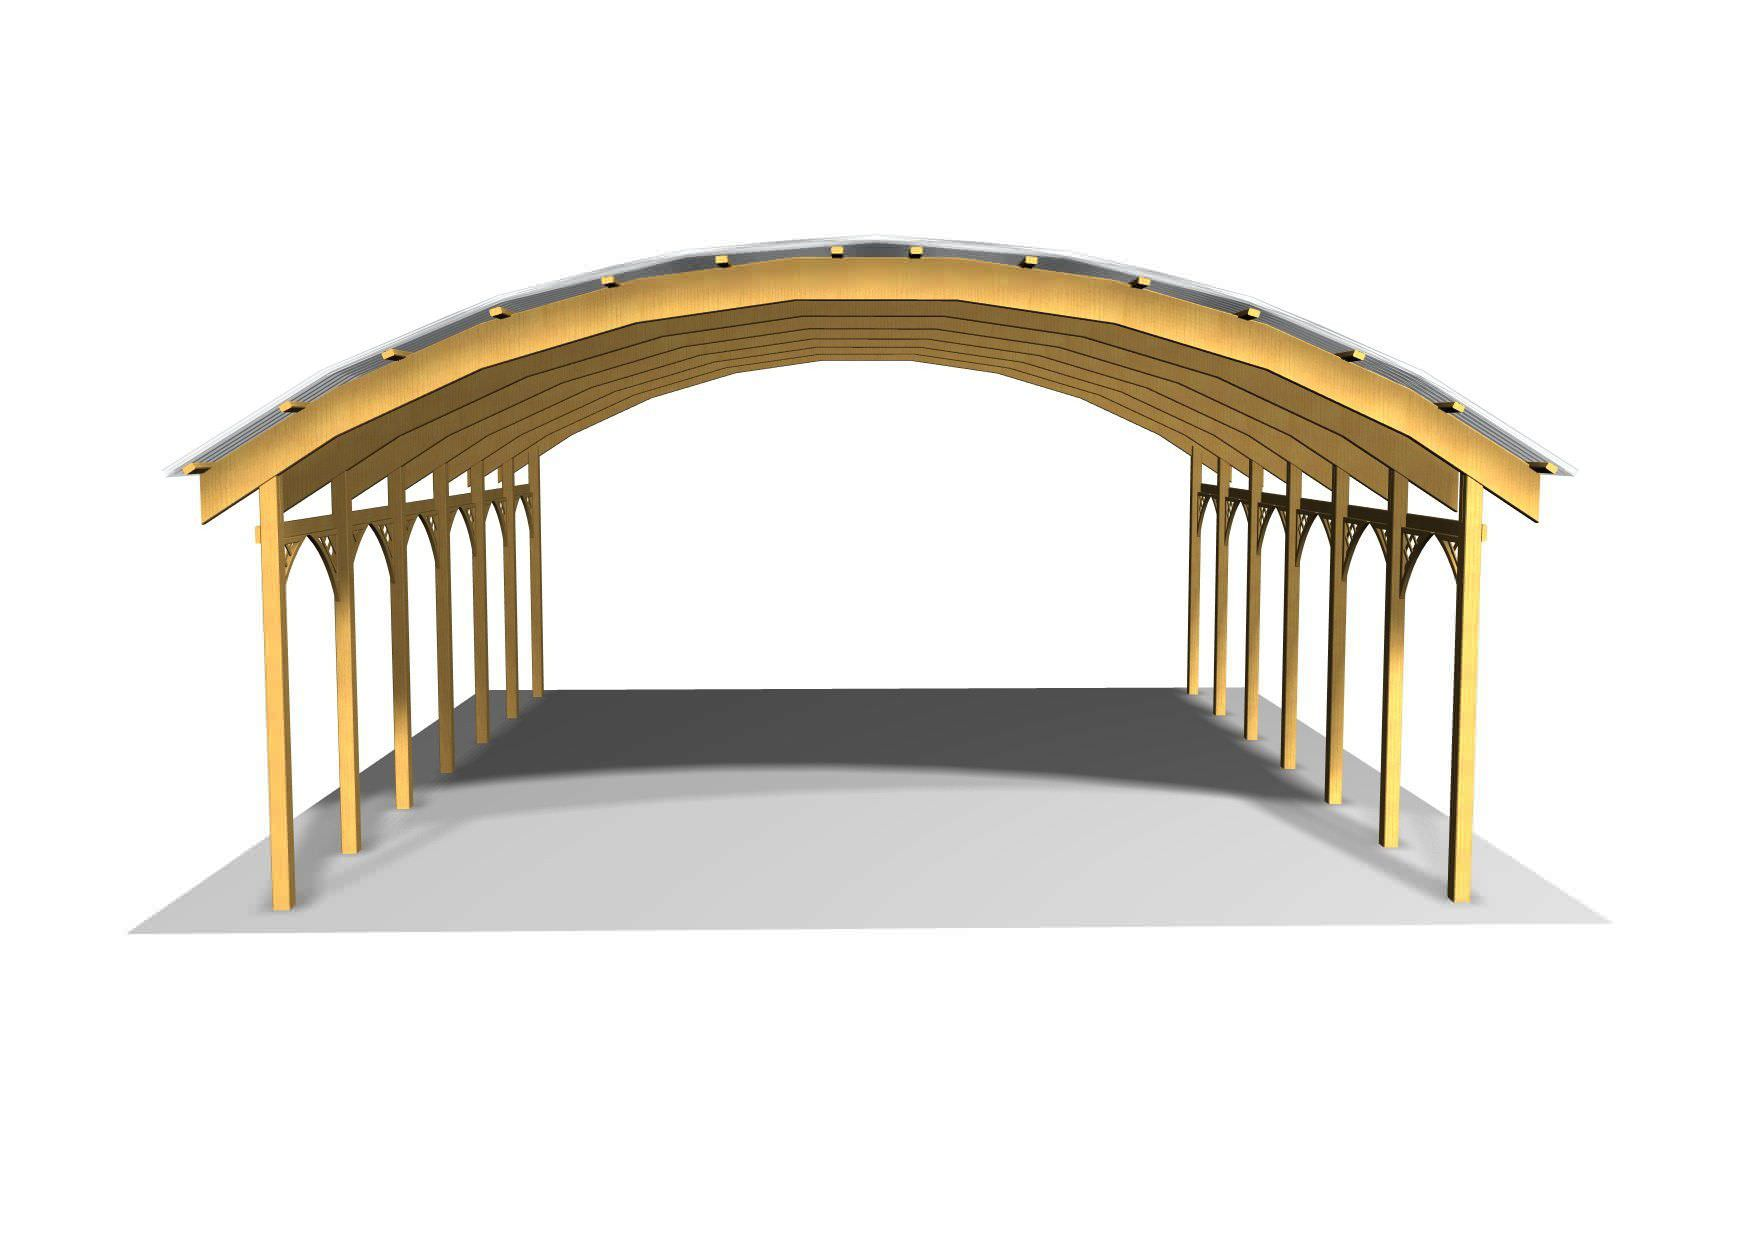 Pvc carport wooden conwy ecocurves